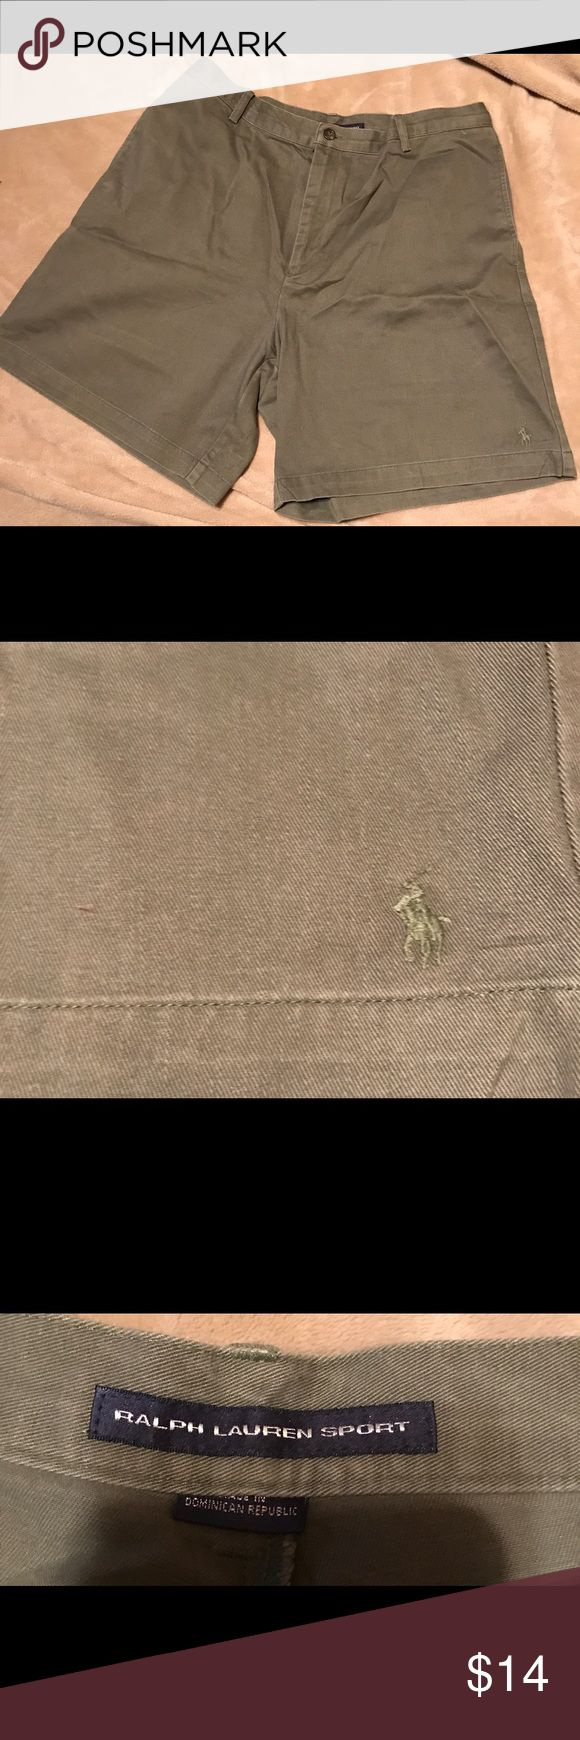 Ralph Lauren Sport Shorts Classy Ralph Lauren shorts. Ralph Lauren Shorts